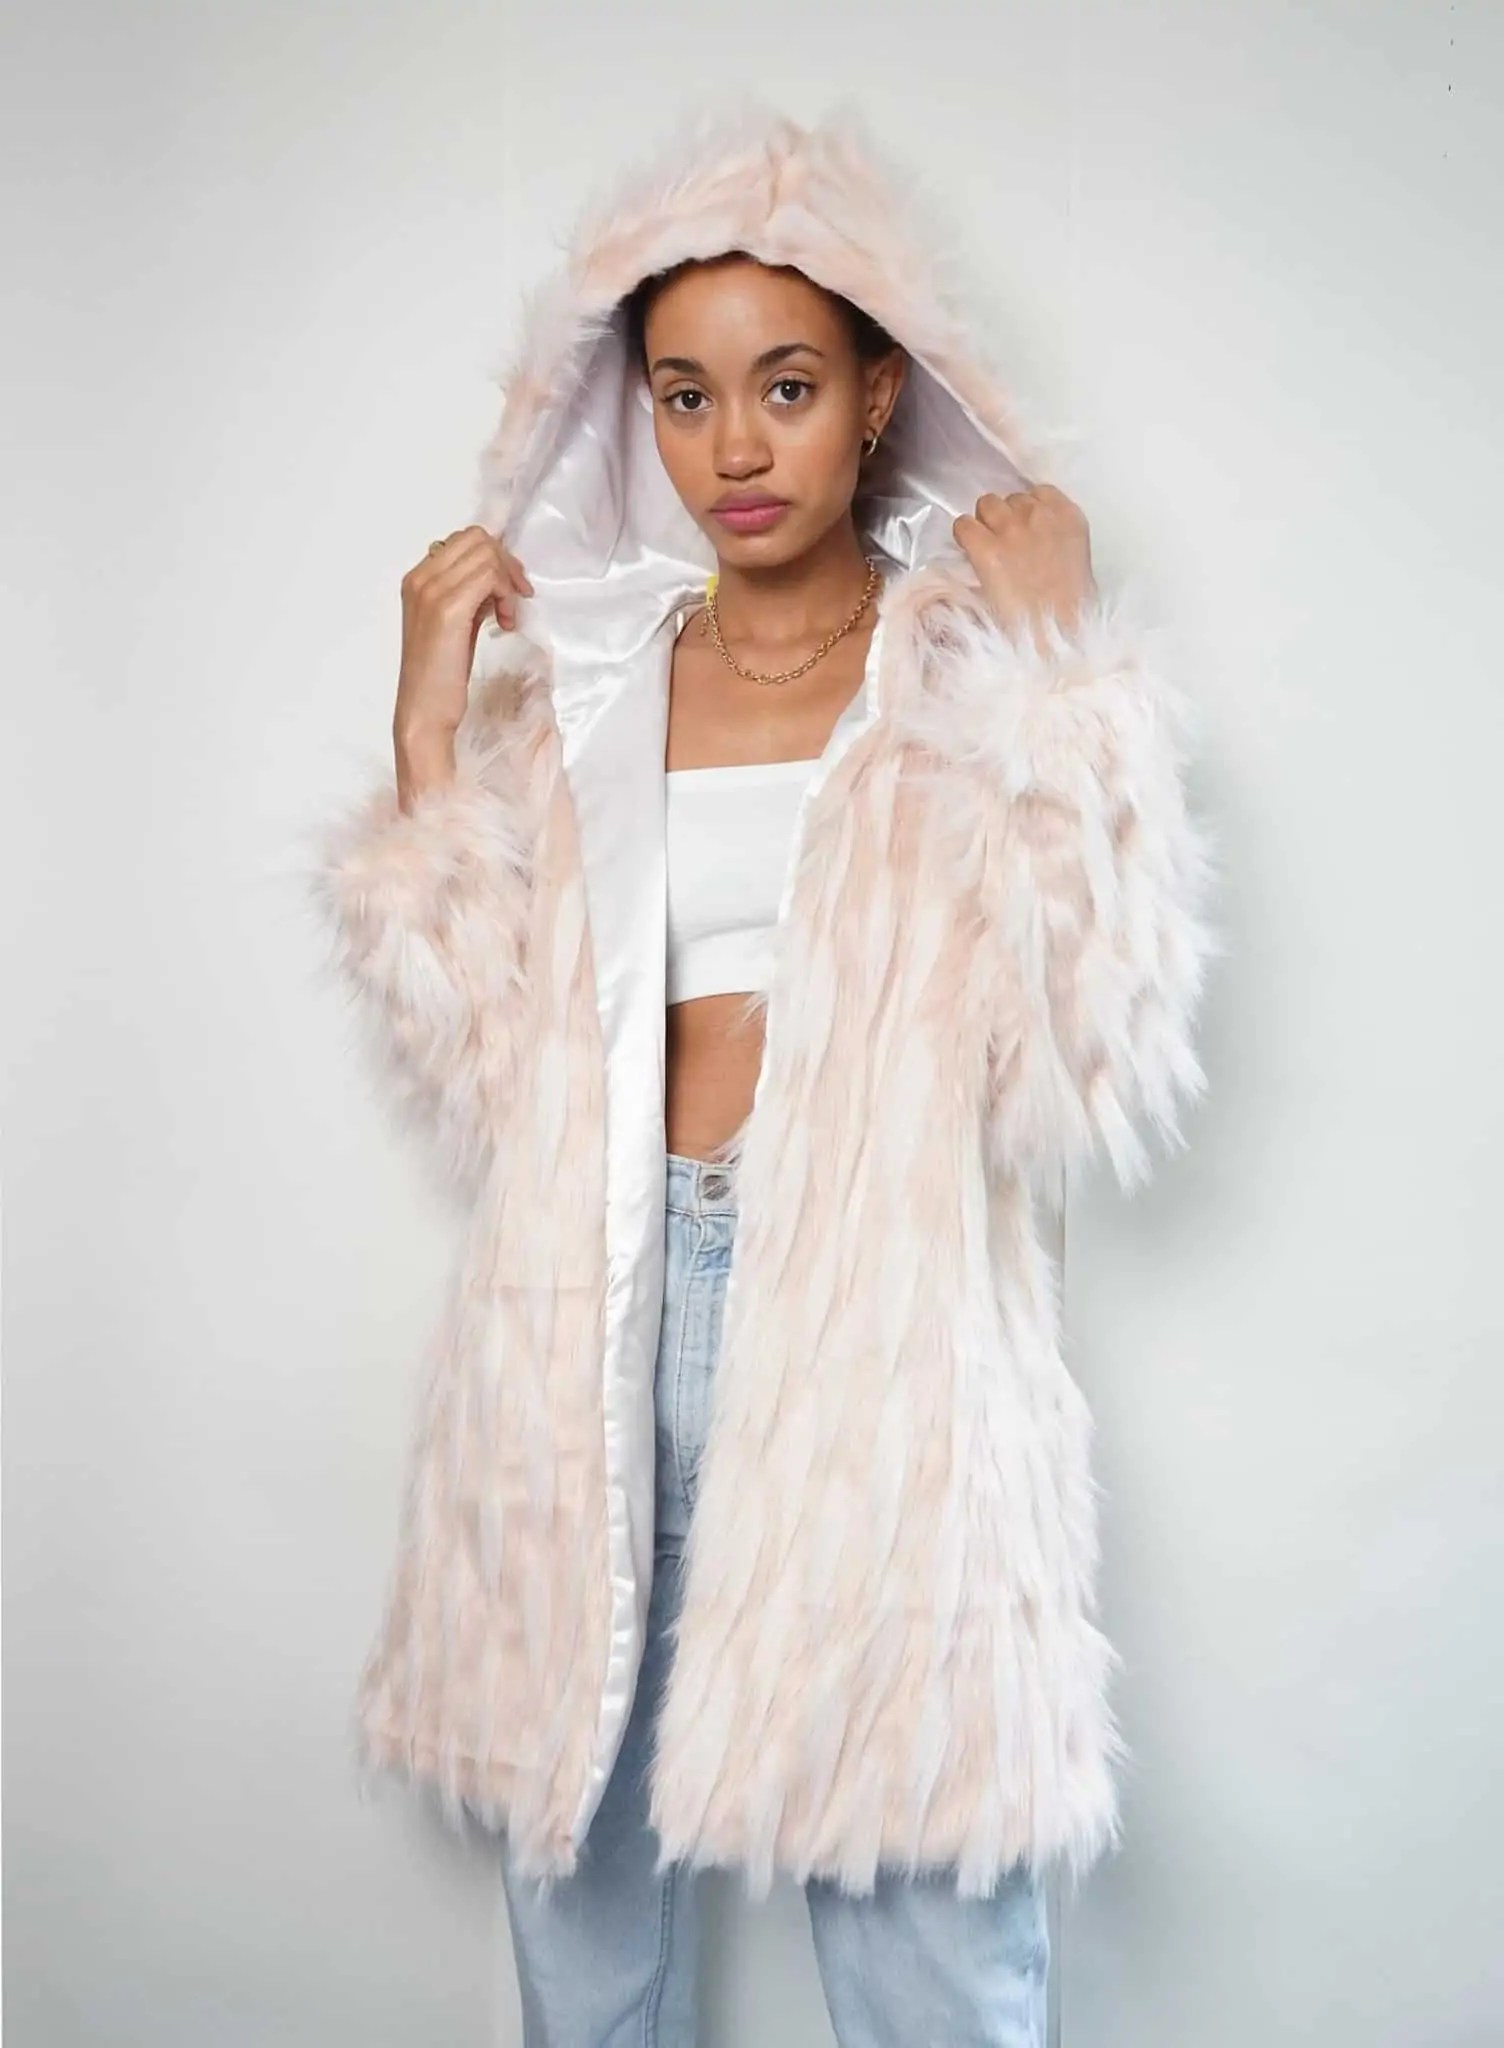 Kasoma Designs | Black Owned Canadian Fashion Shop